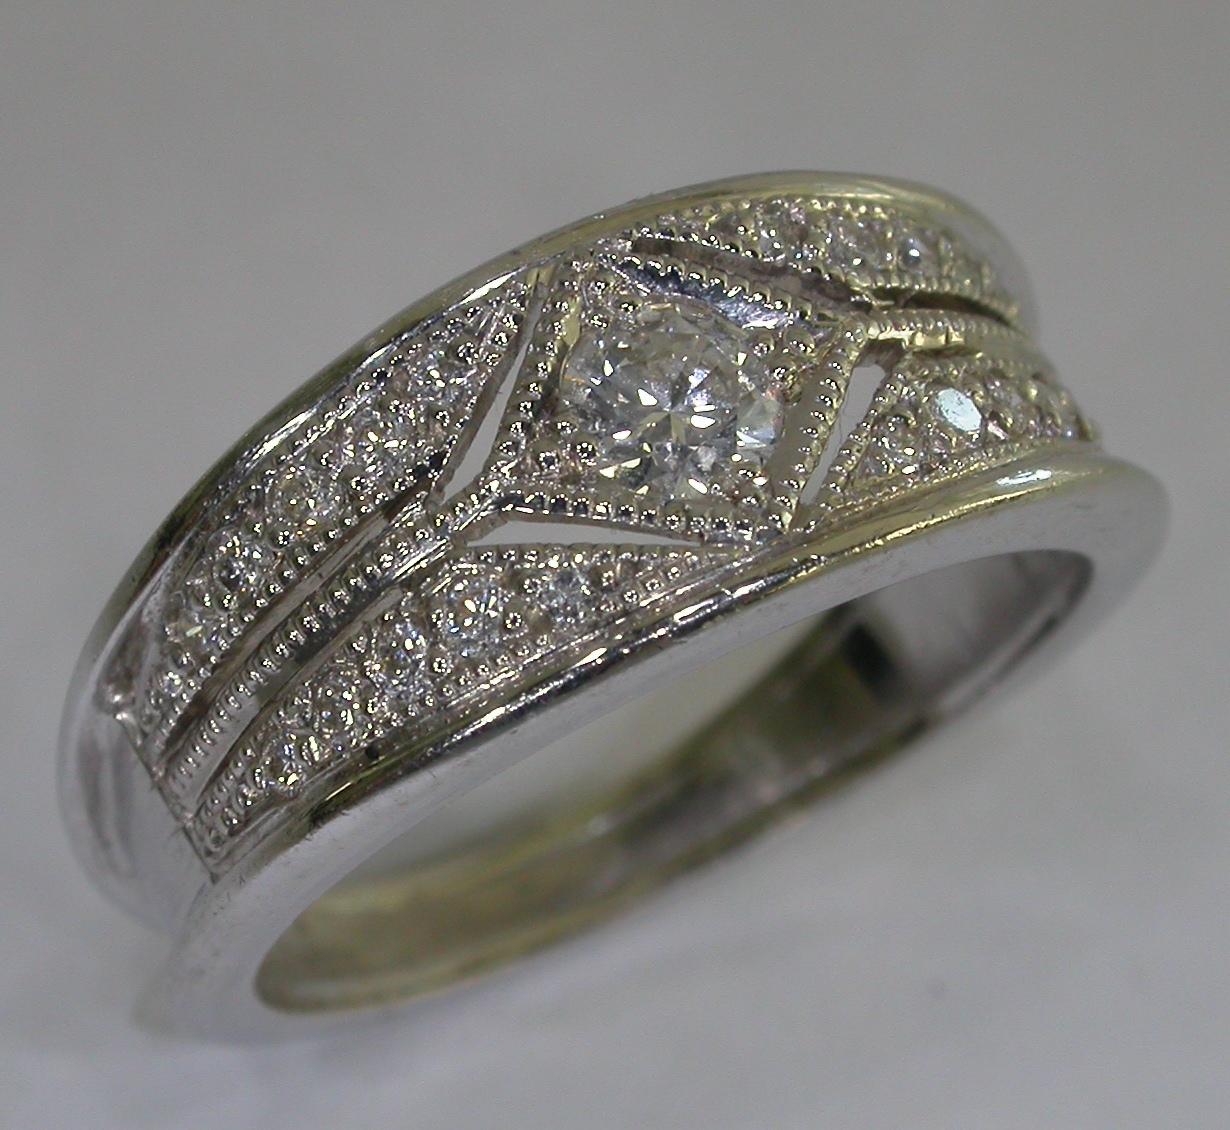 Vintage Engagement Ring - #7069